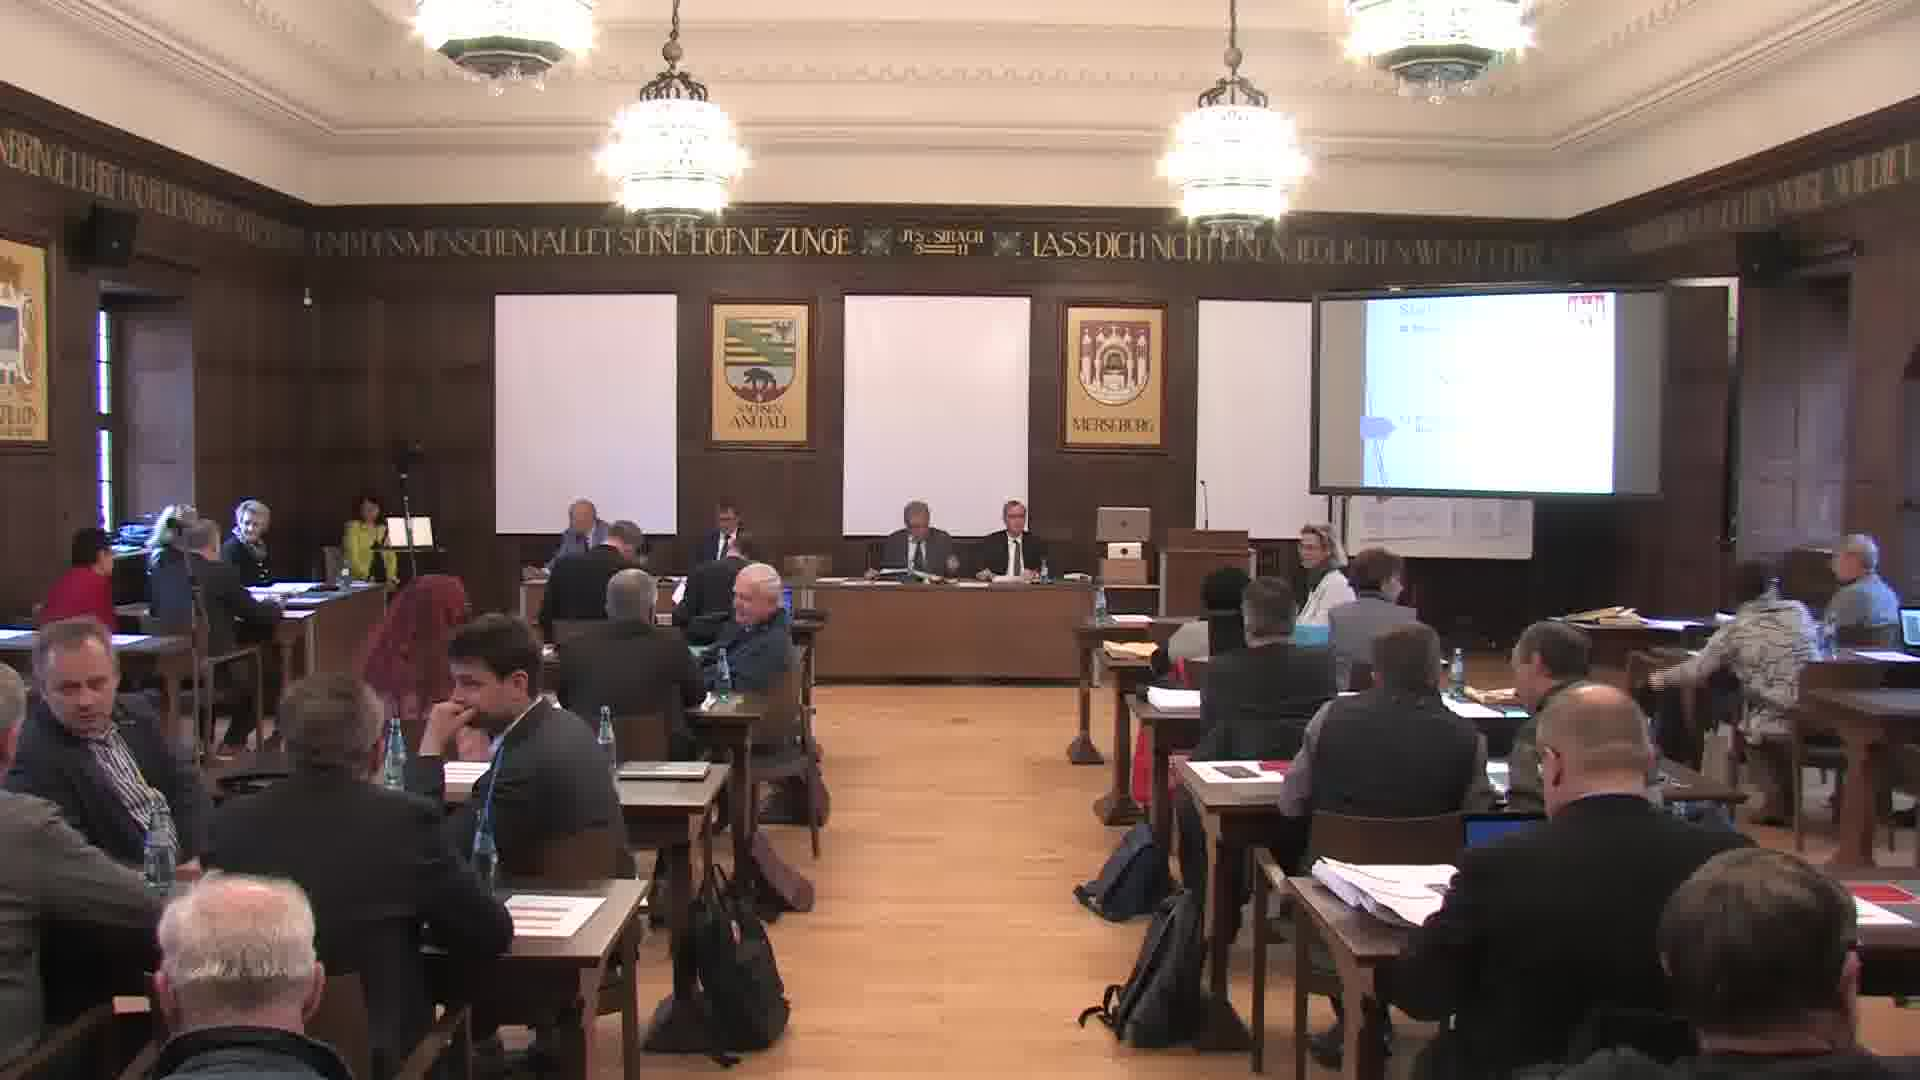 28.Sitzung des Merseburger Stadtrates vom 11. April 2019